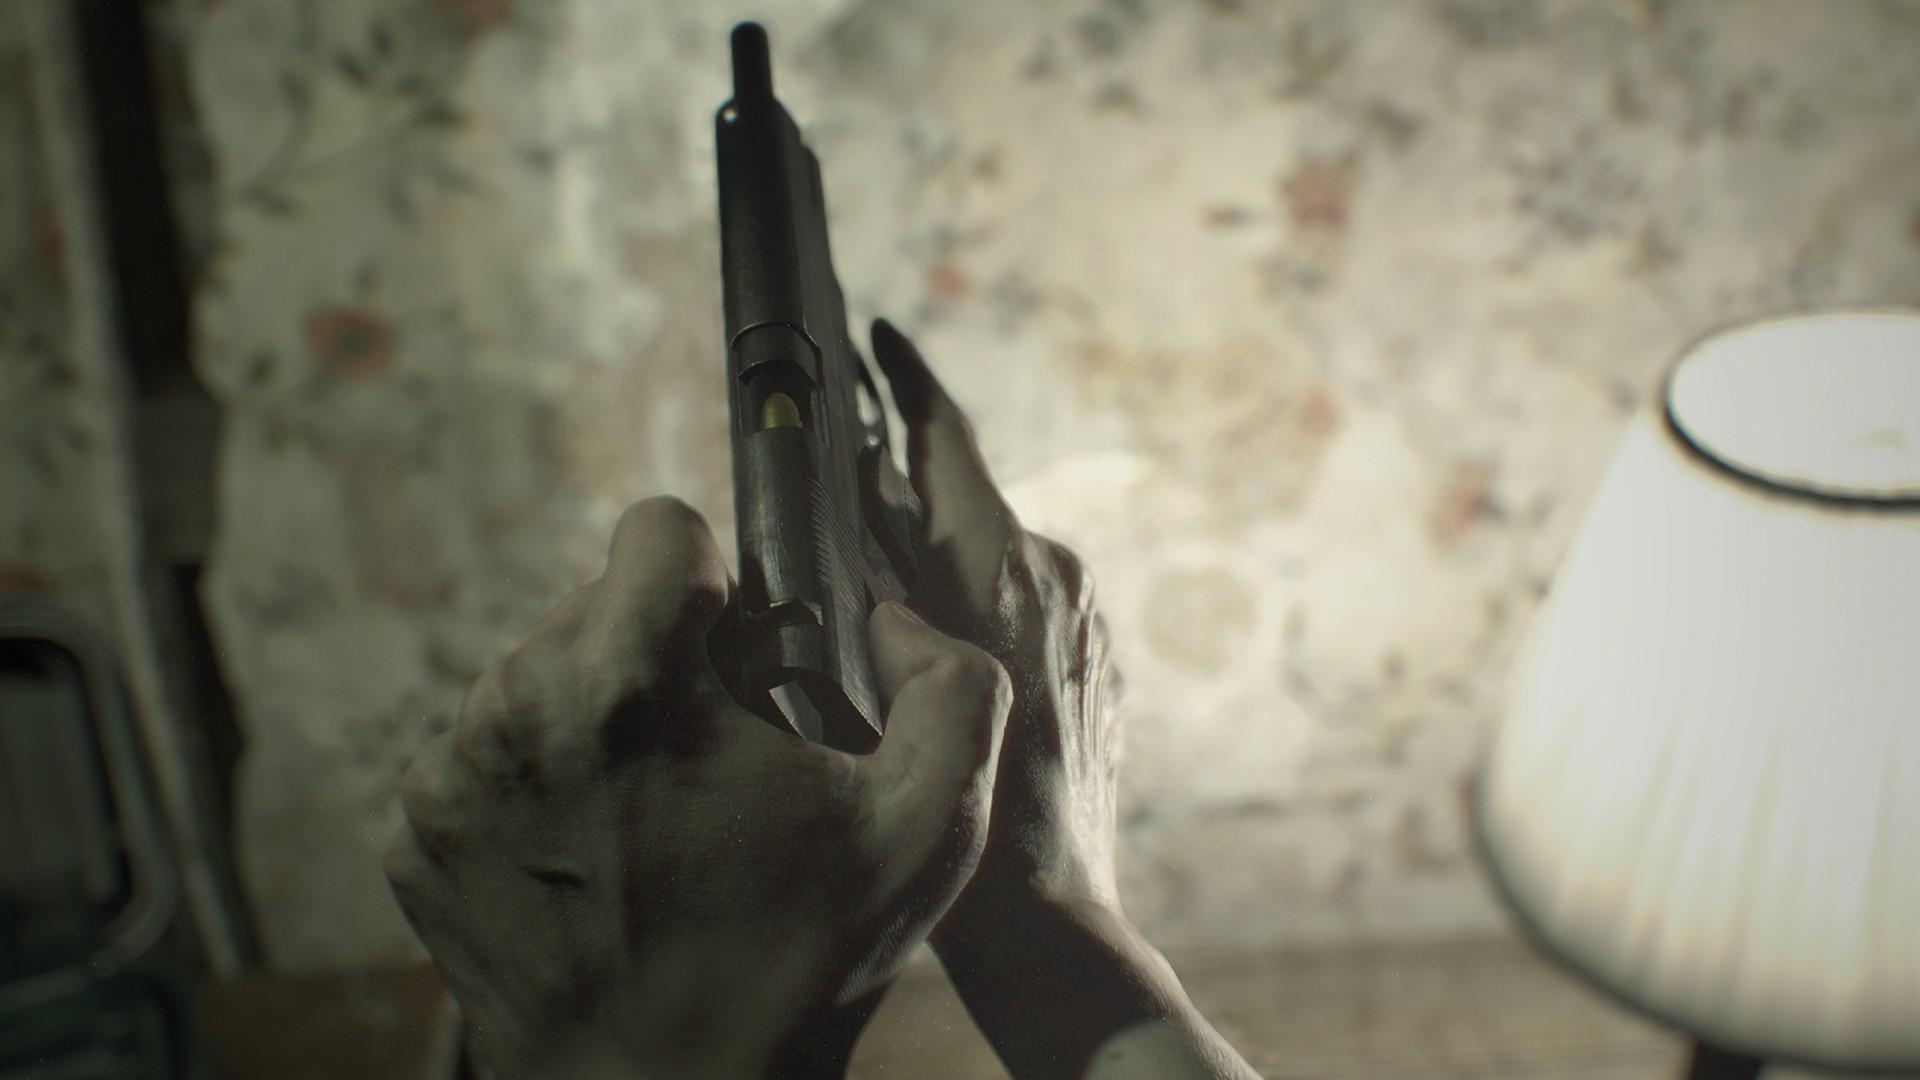 Resident Evil 7 Steam Pre-Order Deal Arrives with Demo